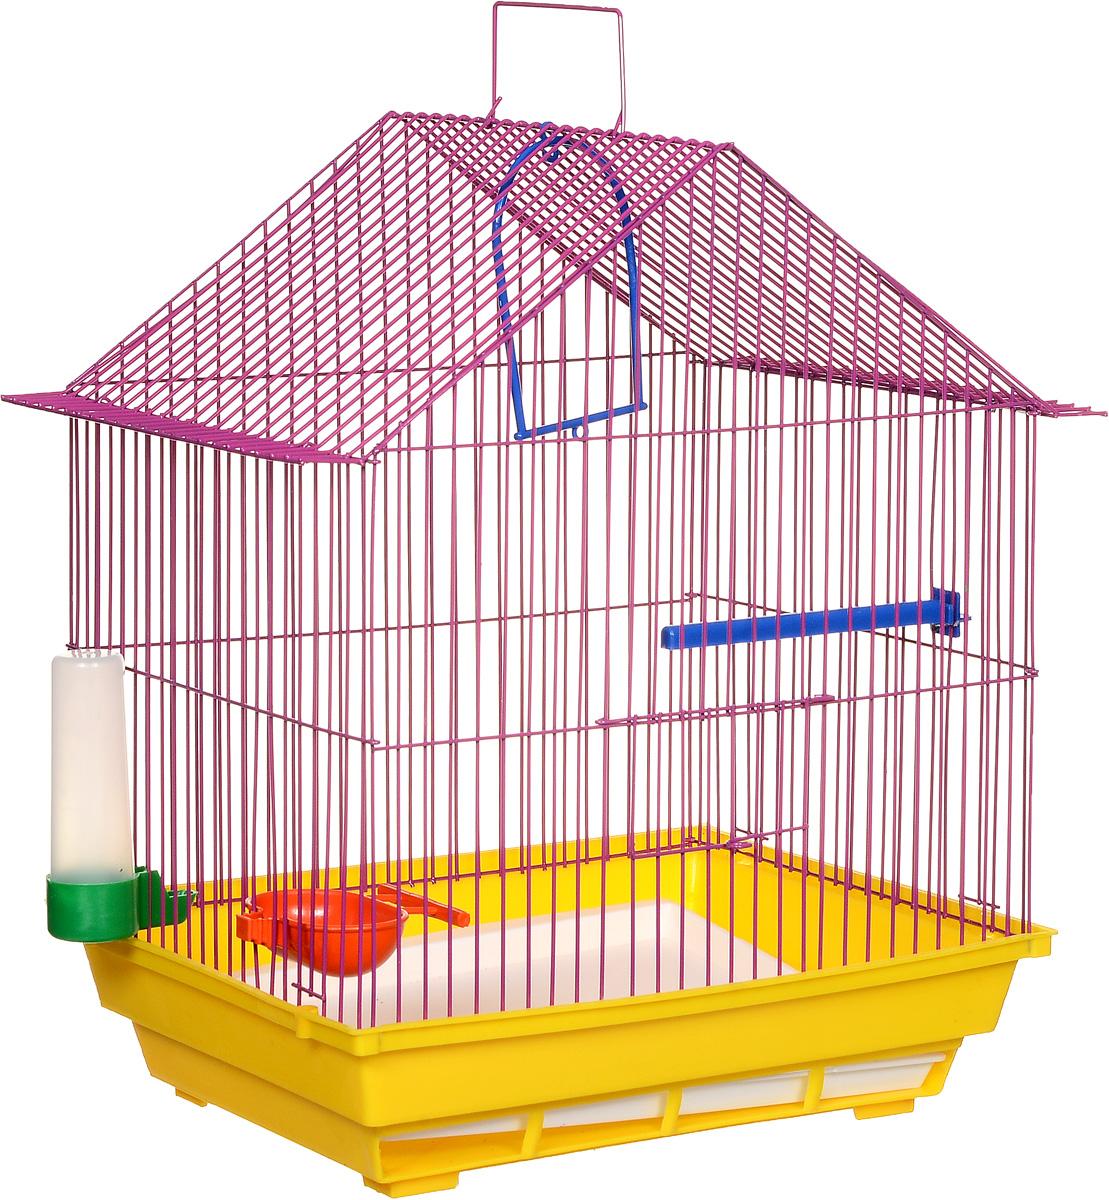 Клетка для птиц ЗооМарк, цвет: желтый поддон, фиолетовая решетка, 39 х 28 х 42 см цена